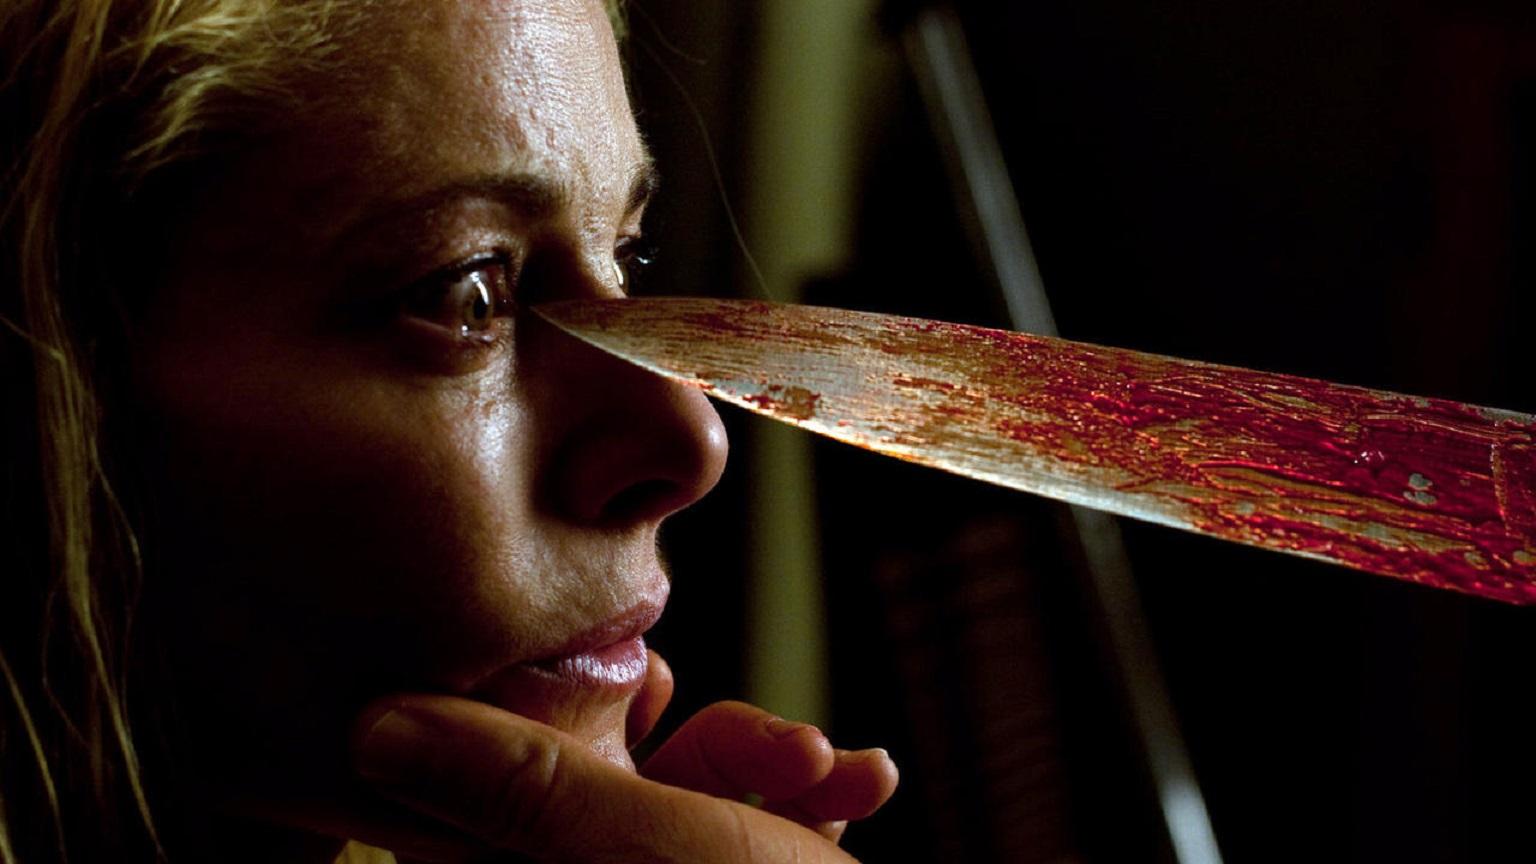 An unseeing Belen Rueda menaced by the killer in Julia's Eyes (2010)